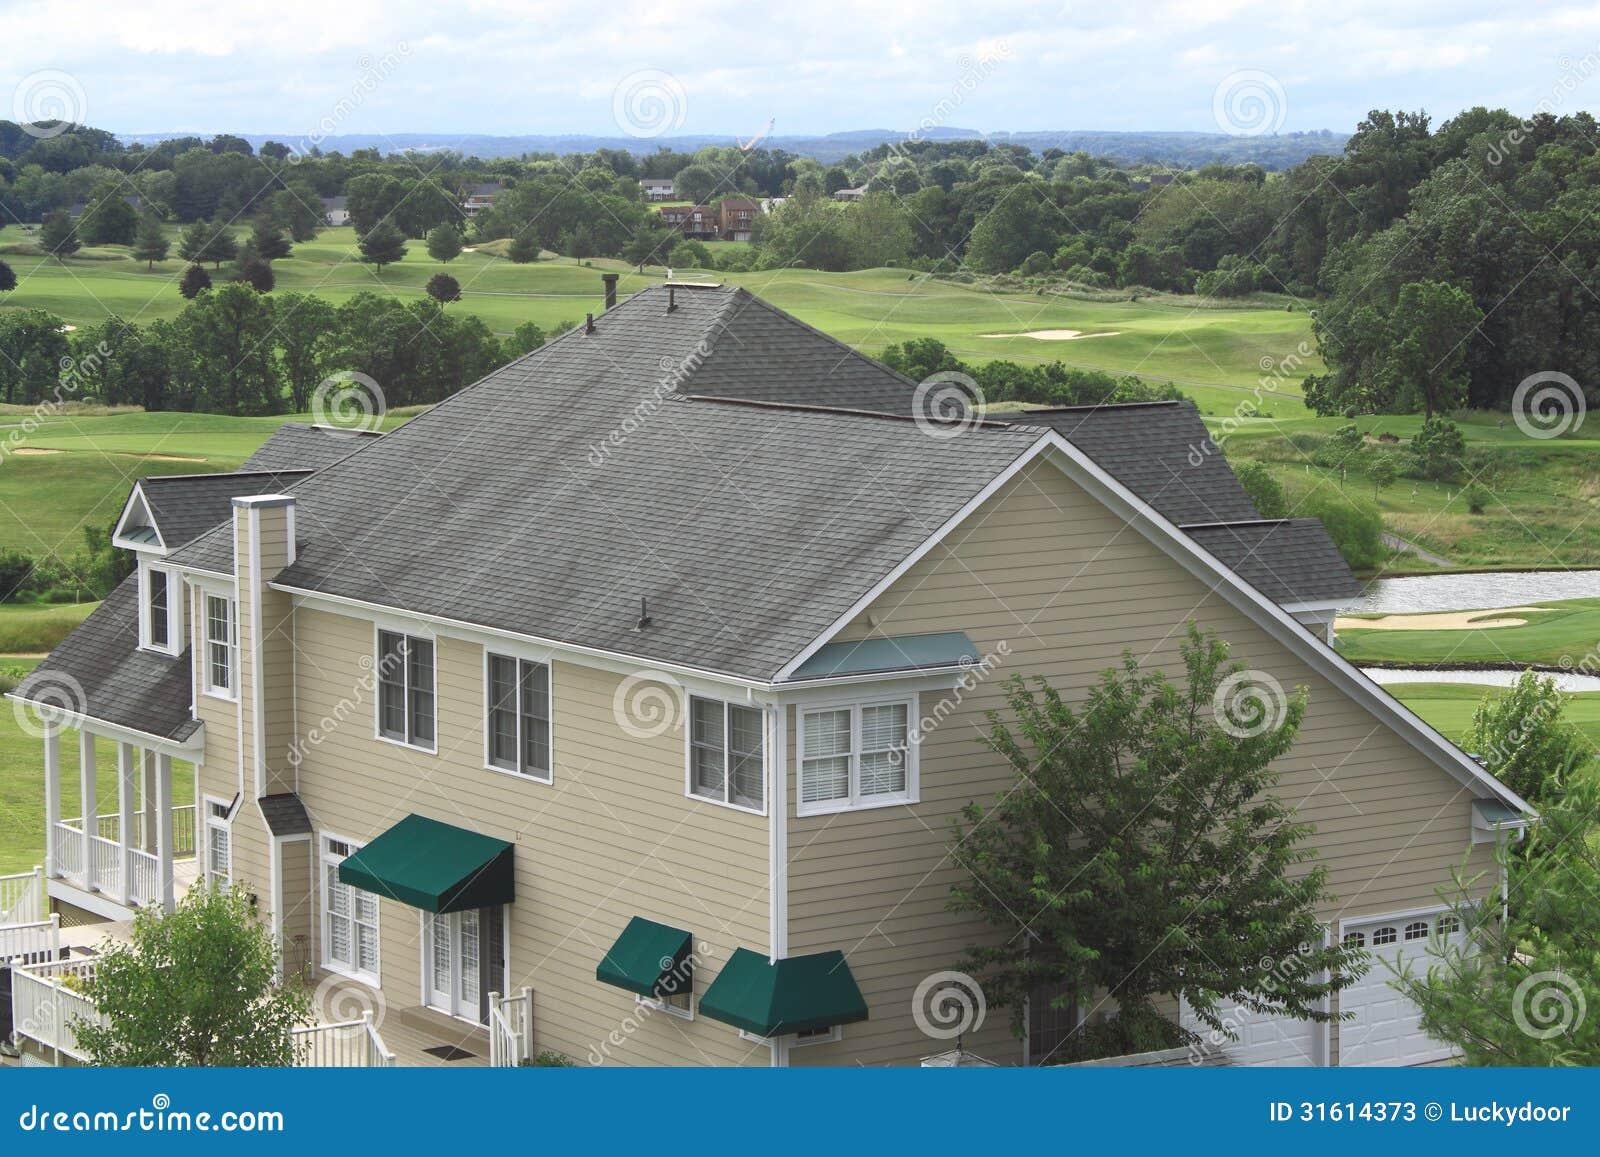 Asphalt Shingle Roof Stock Image Image Of Green Hill